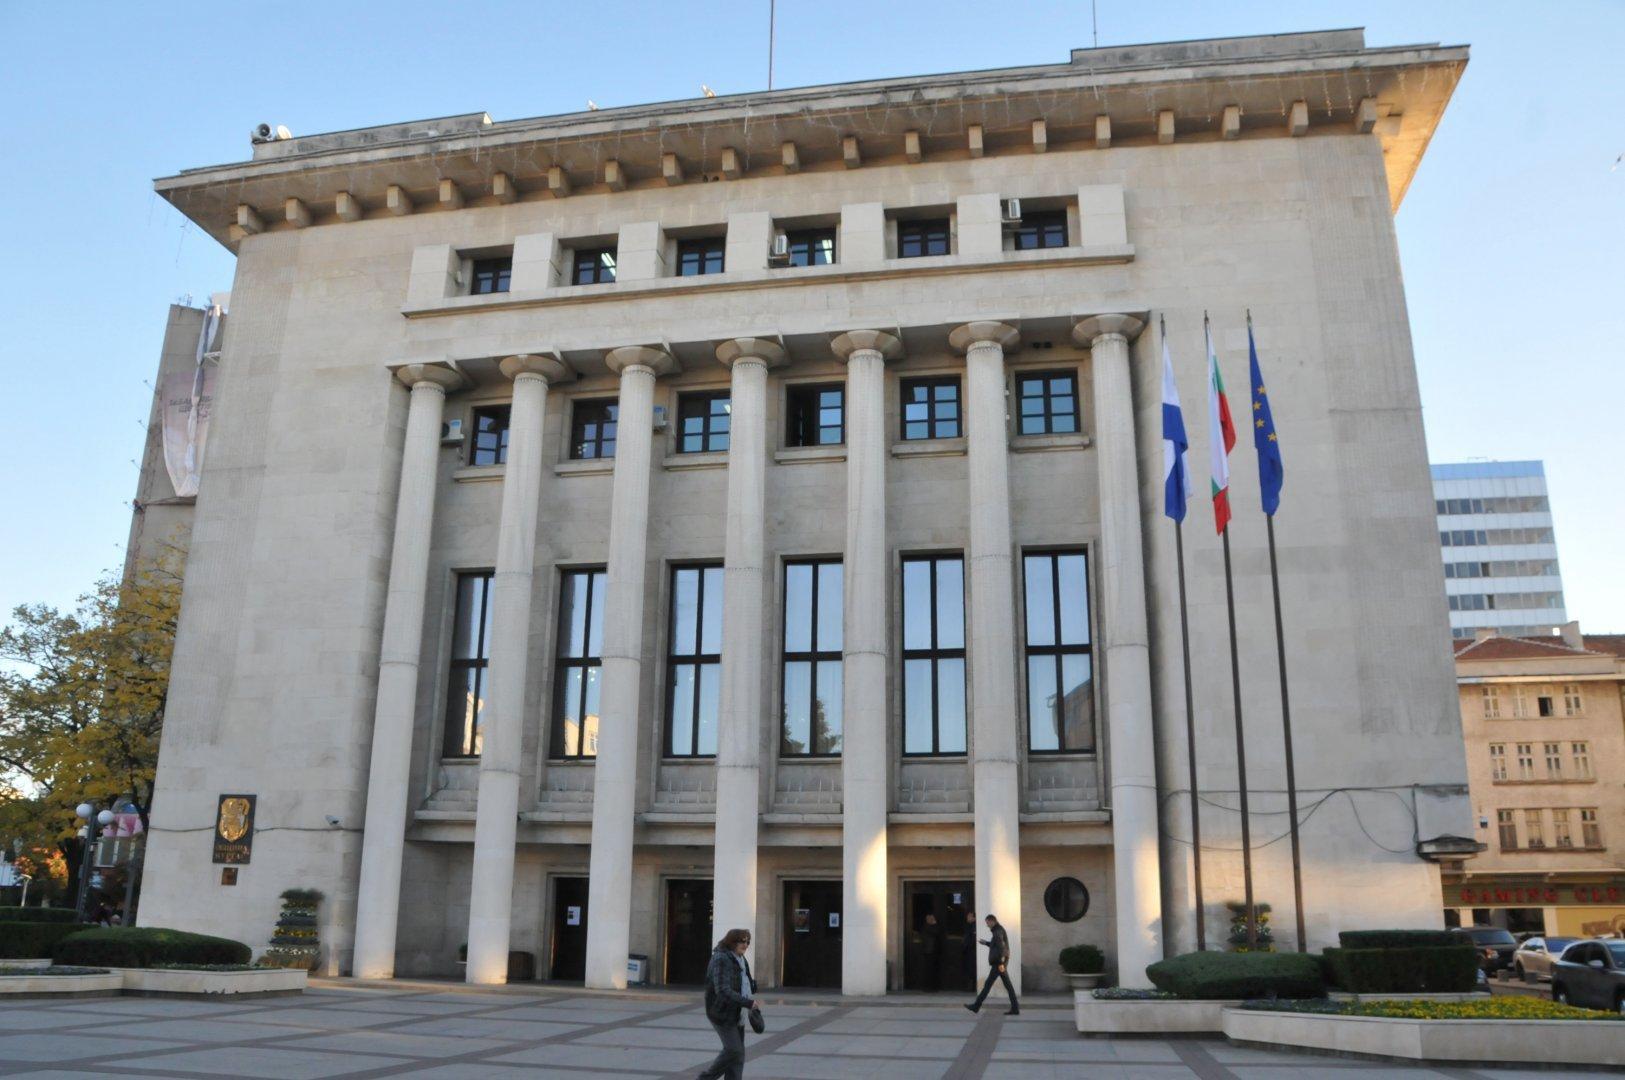 Община Бургас е партньор по проекта. Снимка Архив Черноморие-Бг